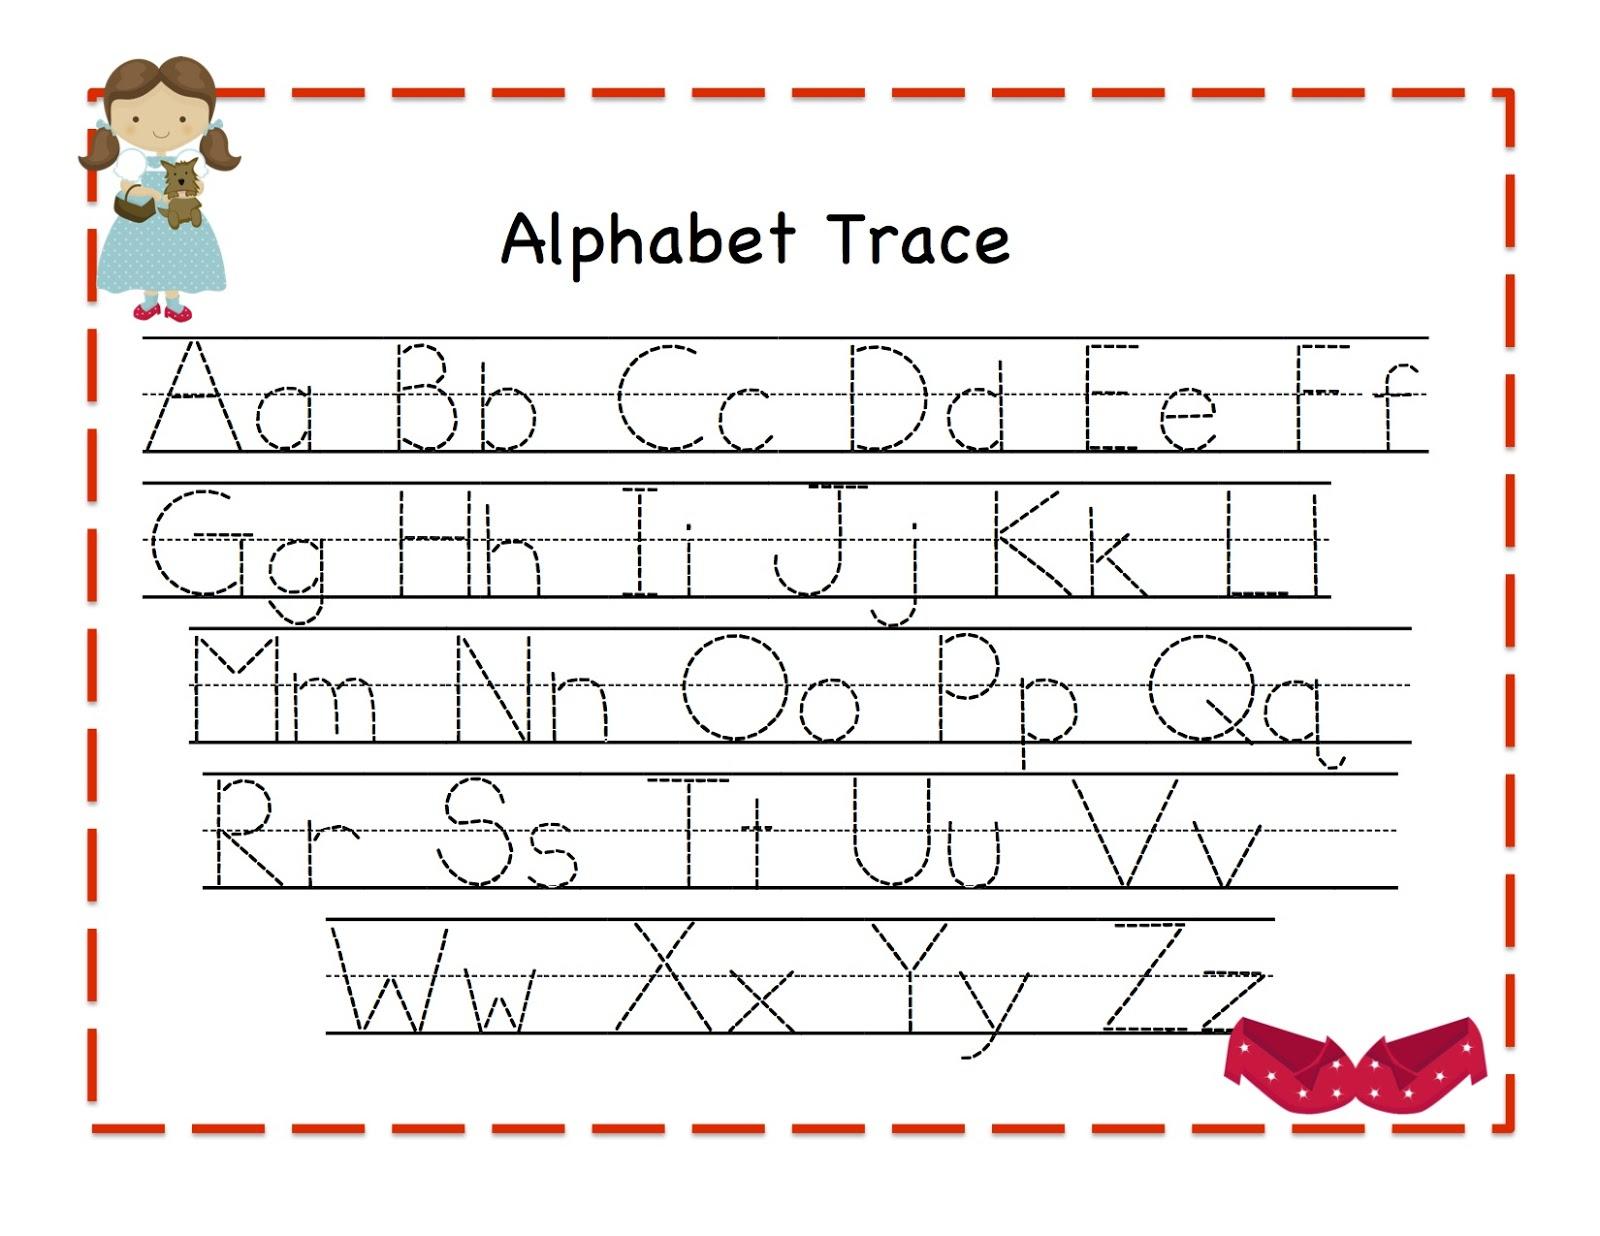 Free Alphabet Tracing Templates ] - Tracing Letters Template with Letter Tracing Worksheets Template